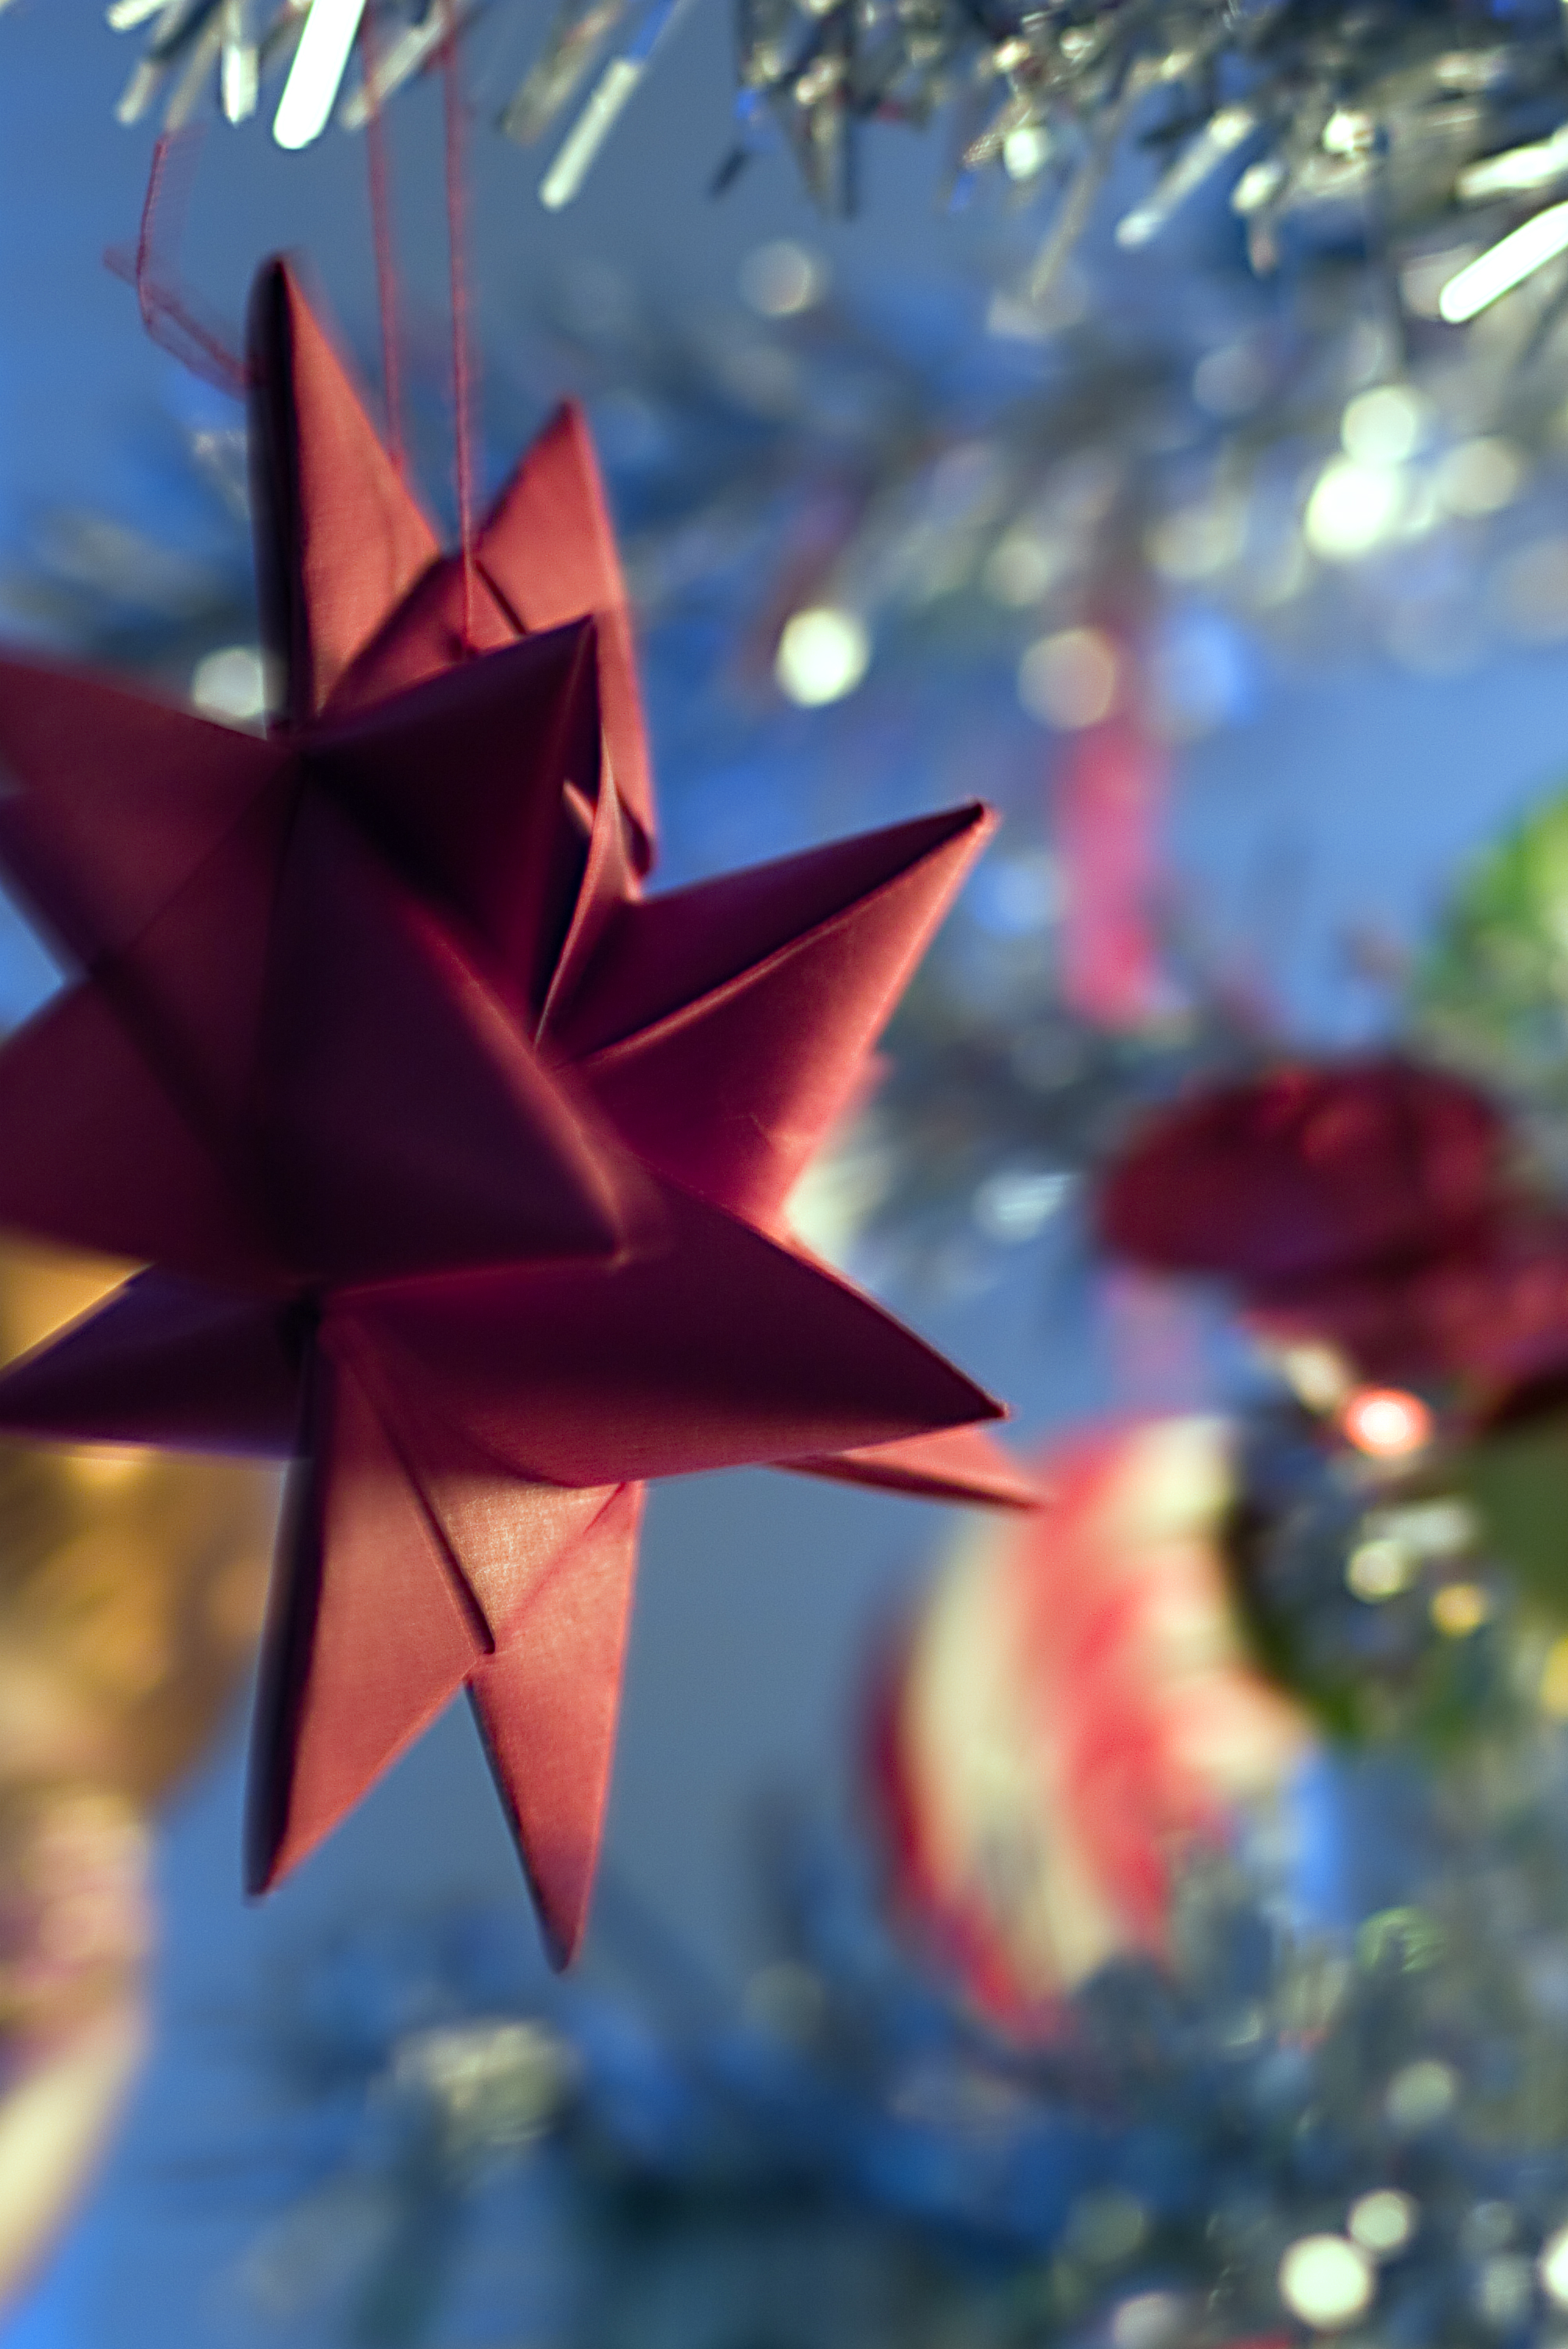 Froebel star - Wikipedia, the free encyclopedia